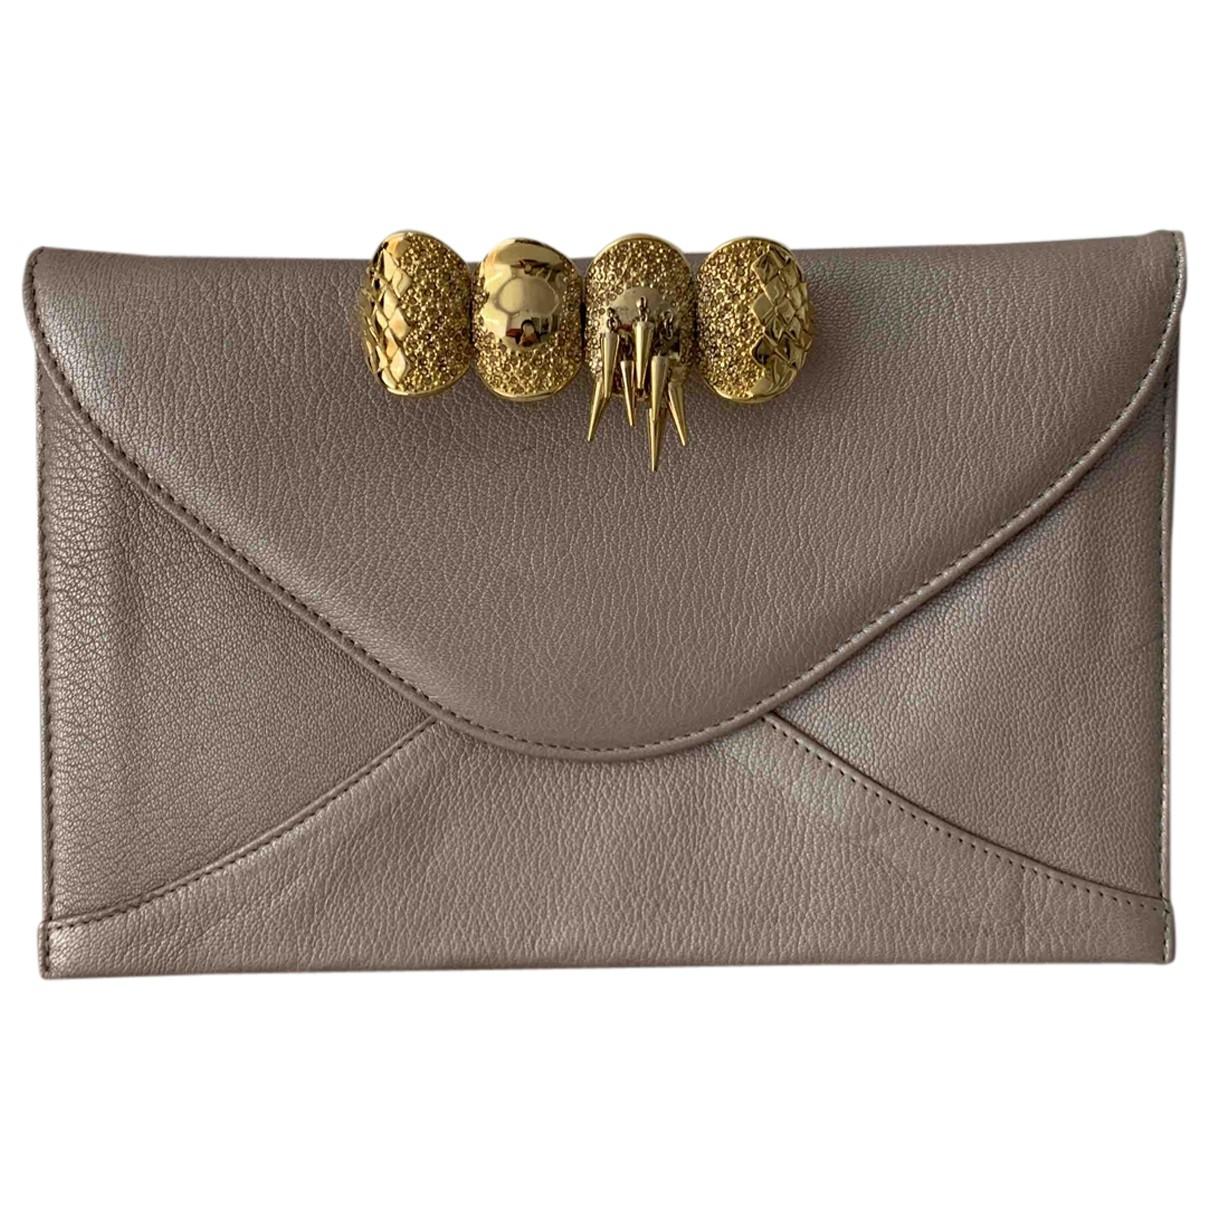 Maison Du Posh \N Metallic Leather Clutch bag for Women \N